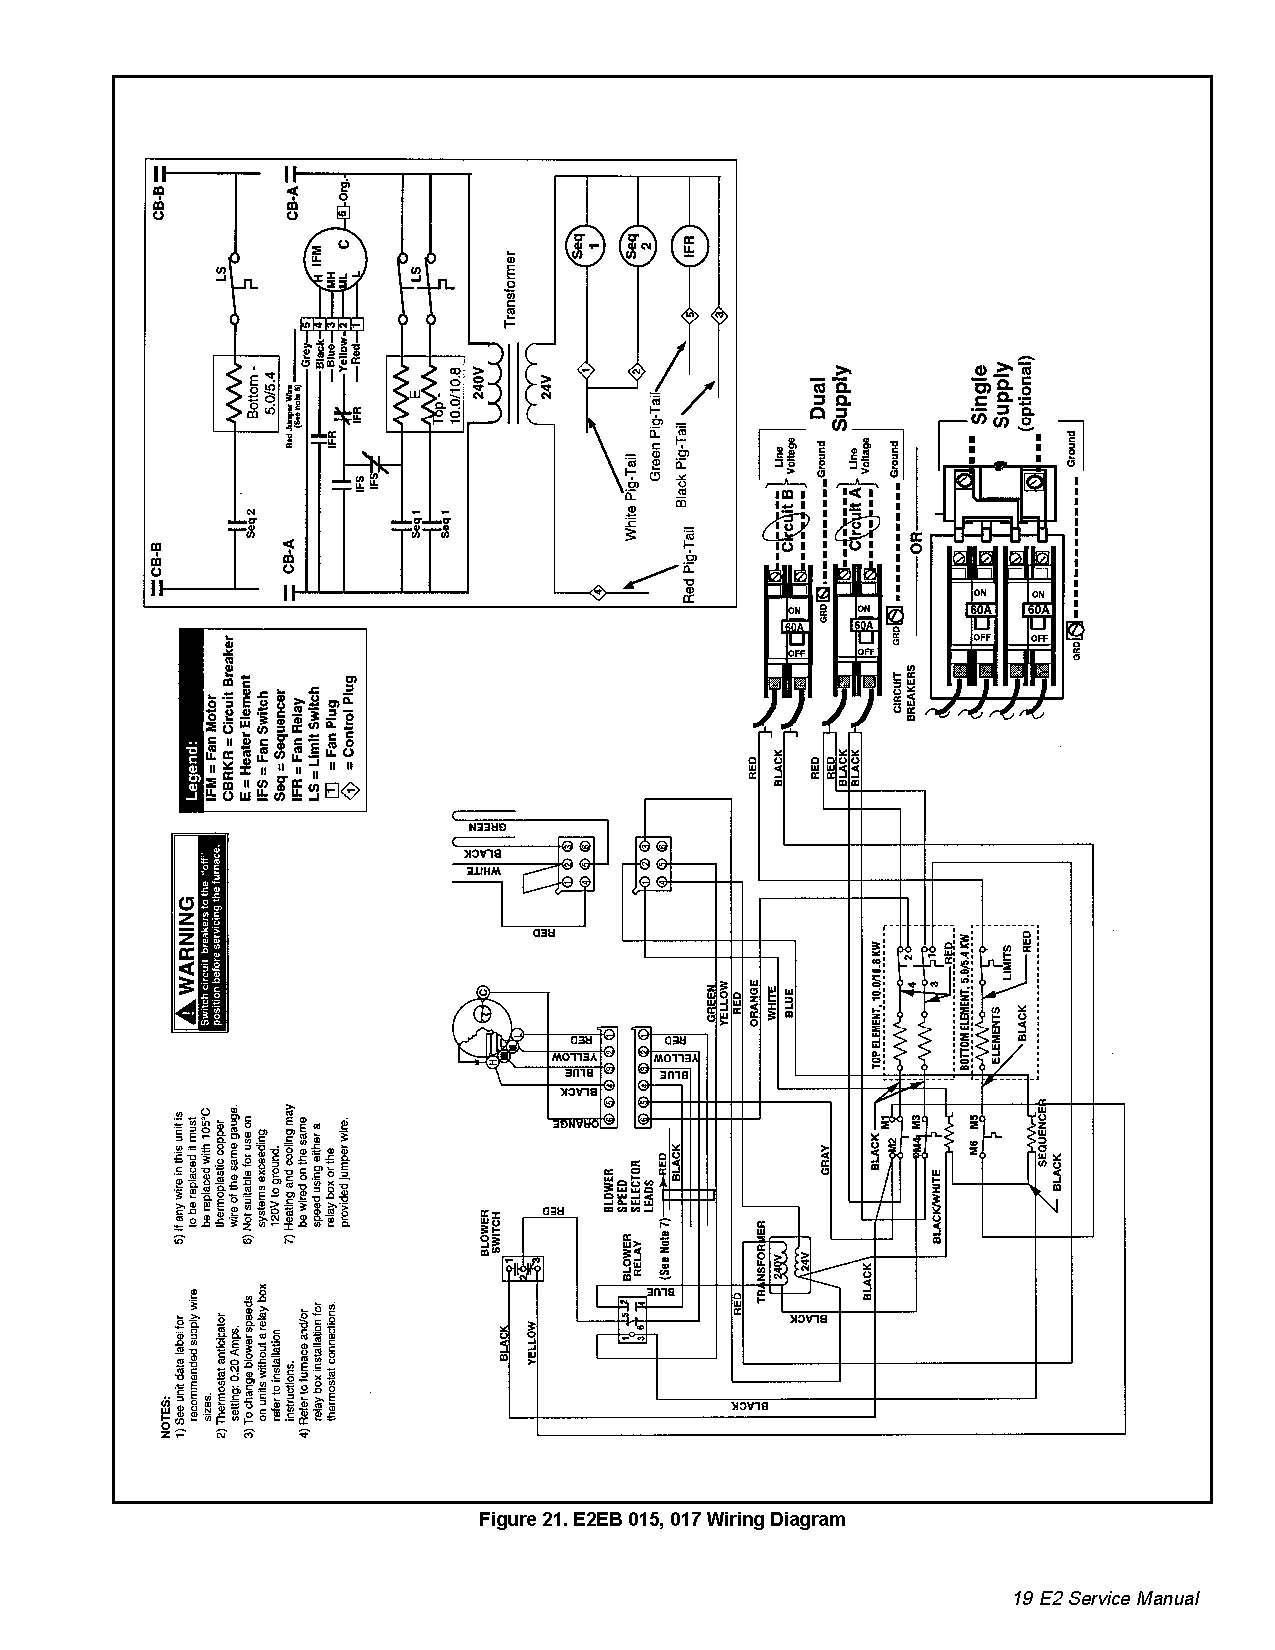 Intertherm E2eb 015ha Wiring Diagram